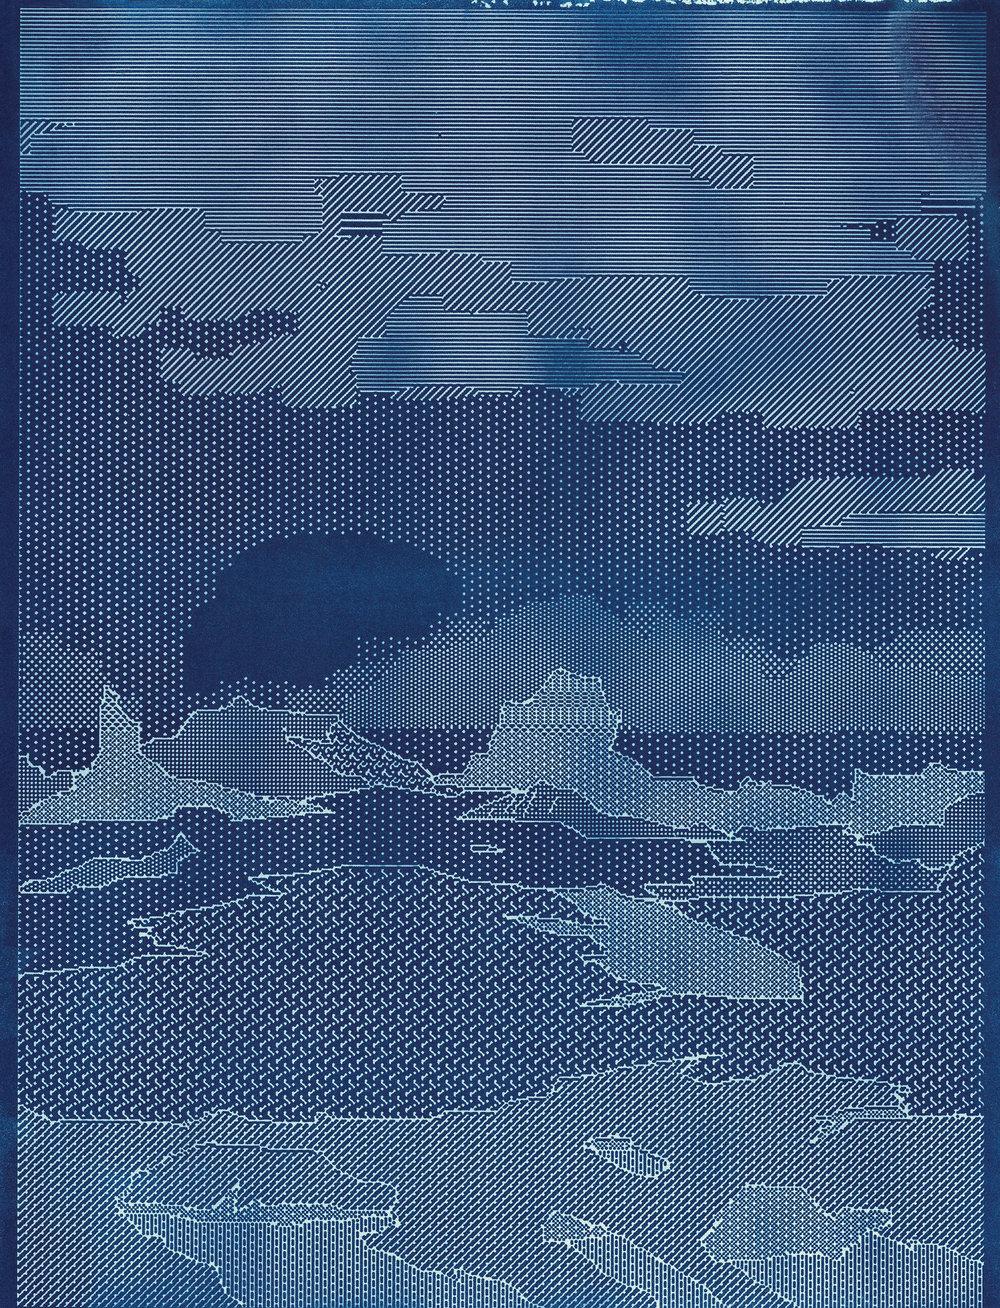 Some Open Tab of @John Wayne/@Bierstadt/@Hokusai, etc.  cyanotype 8.5 x 11 2018